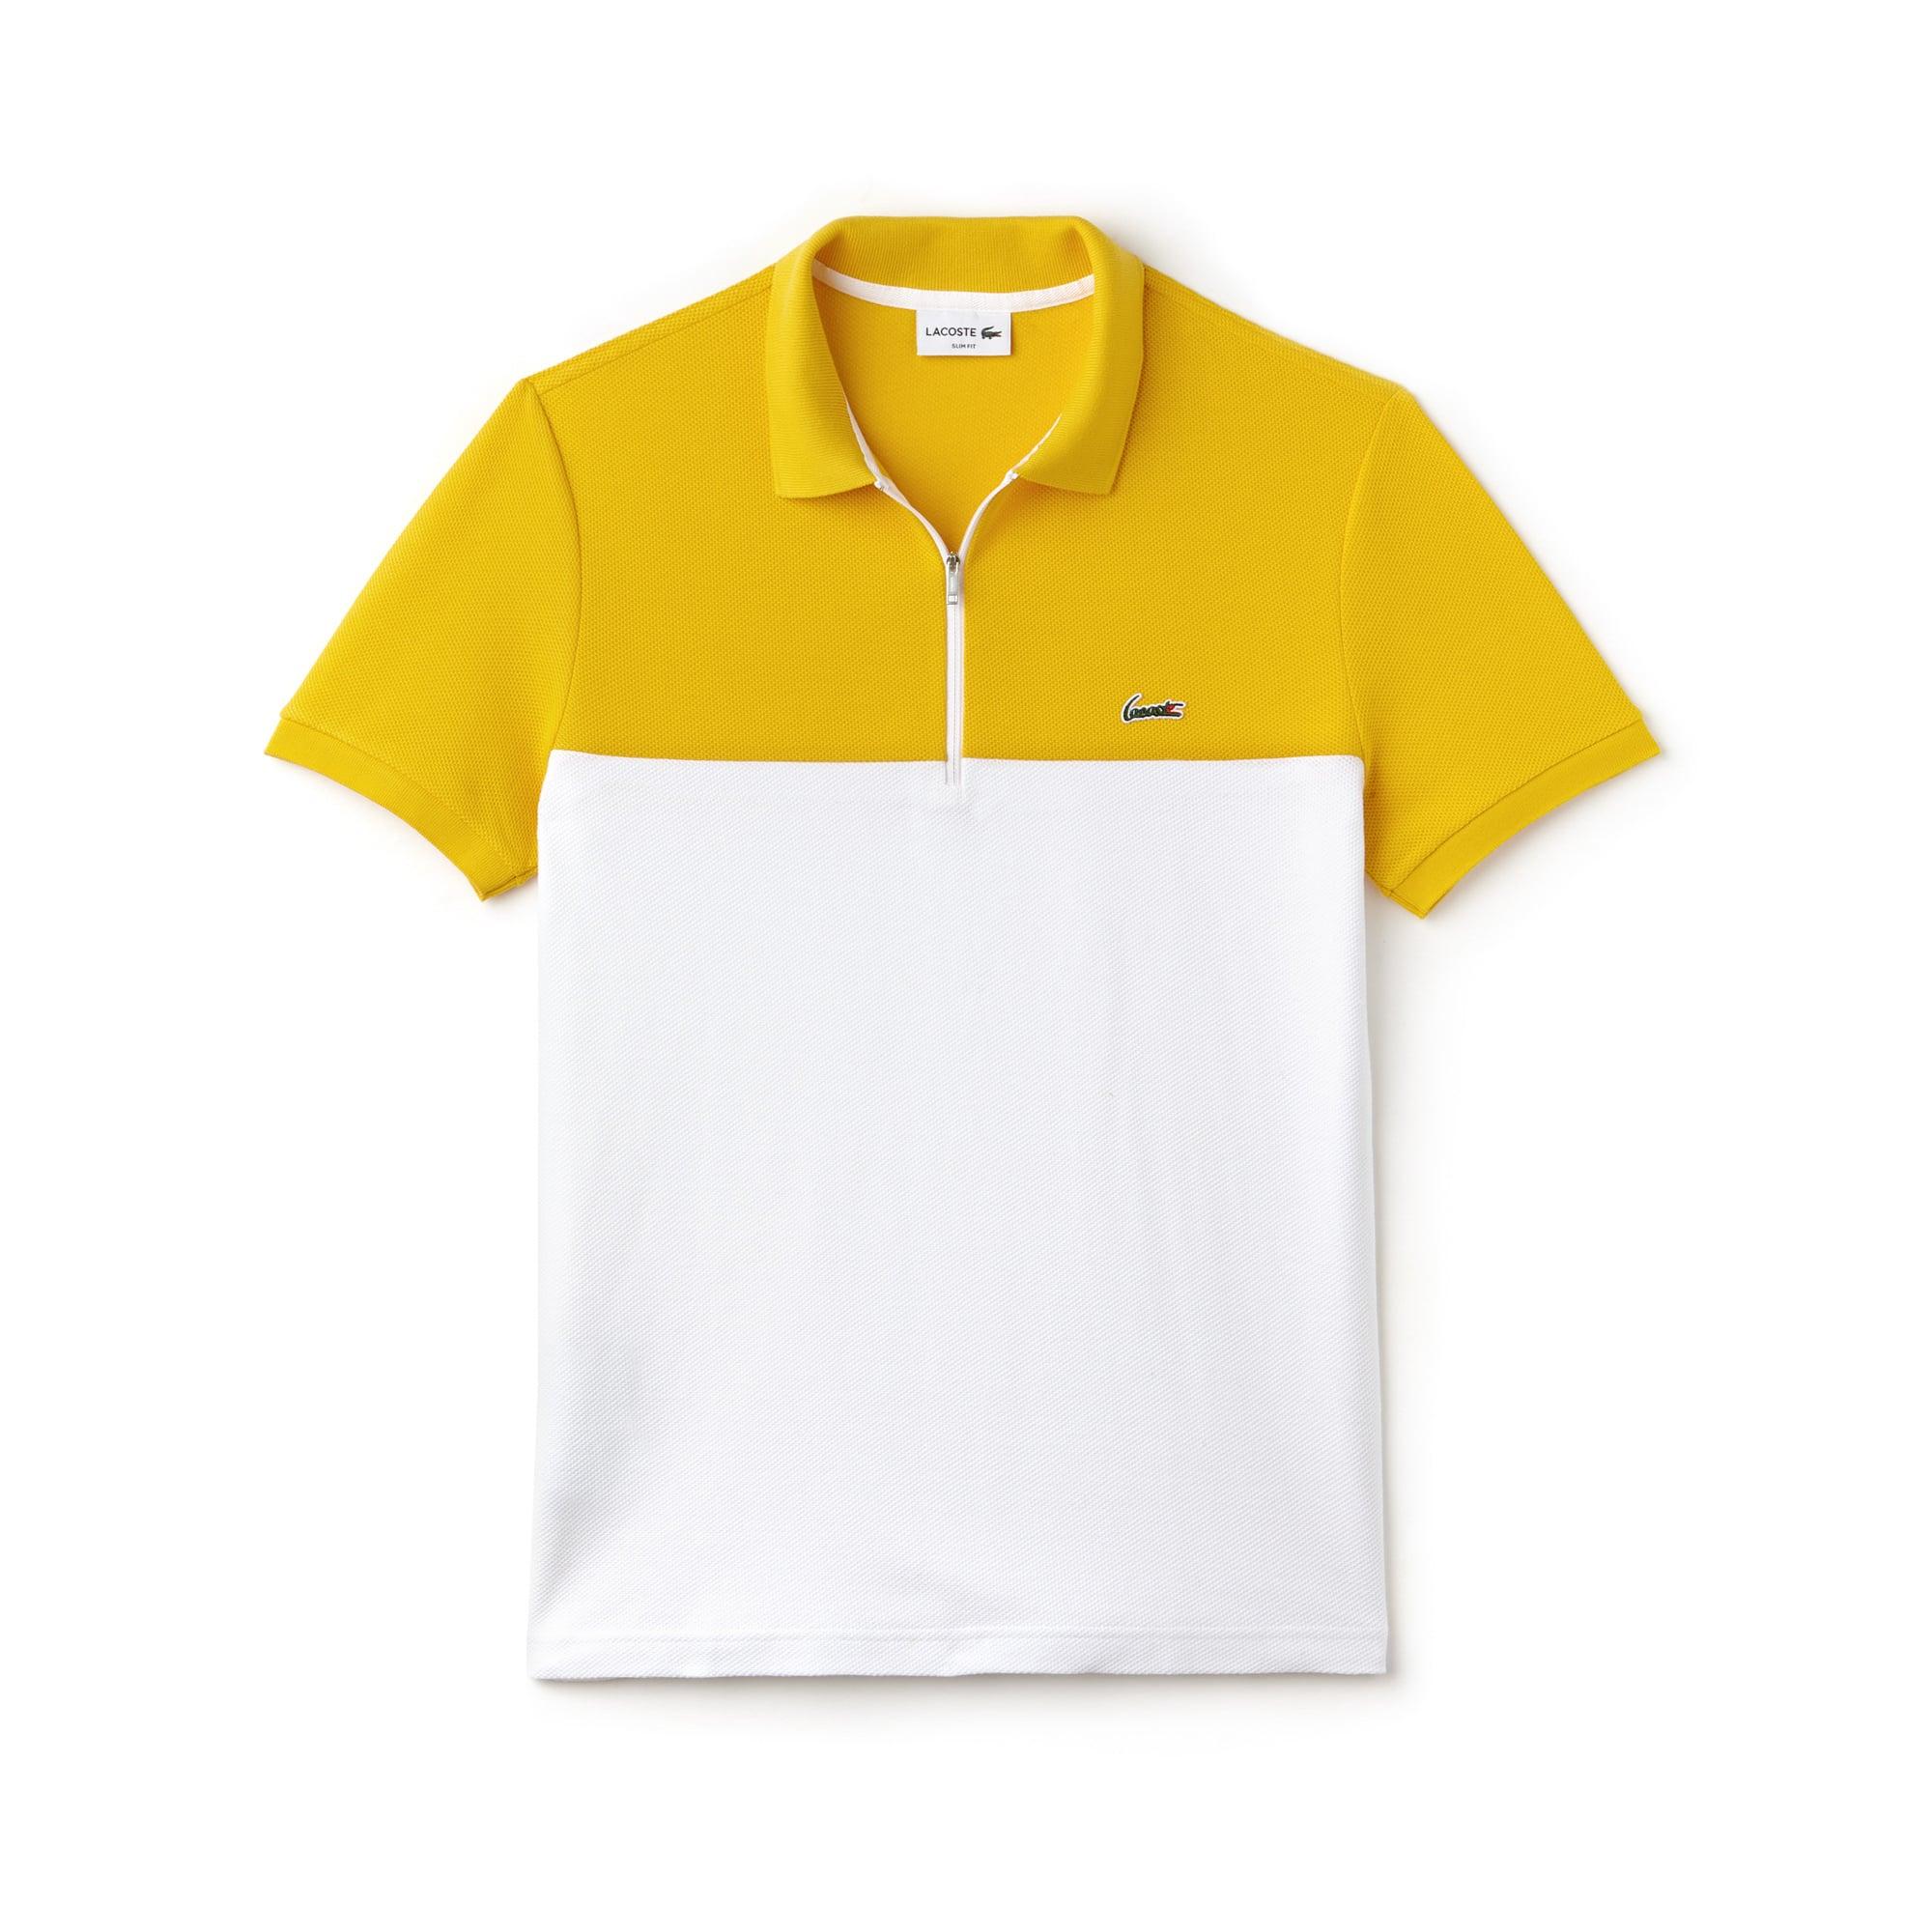 Men's Slim Fit Honeycomb Polo